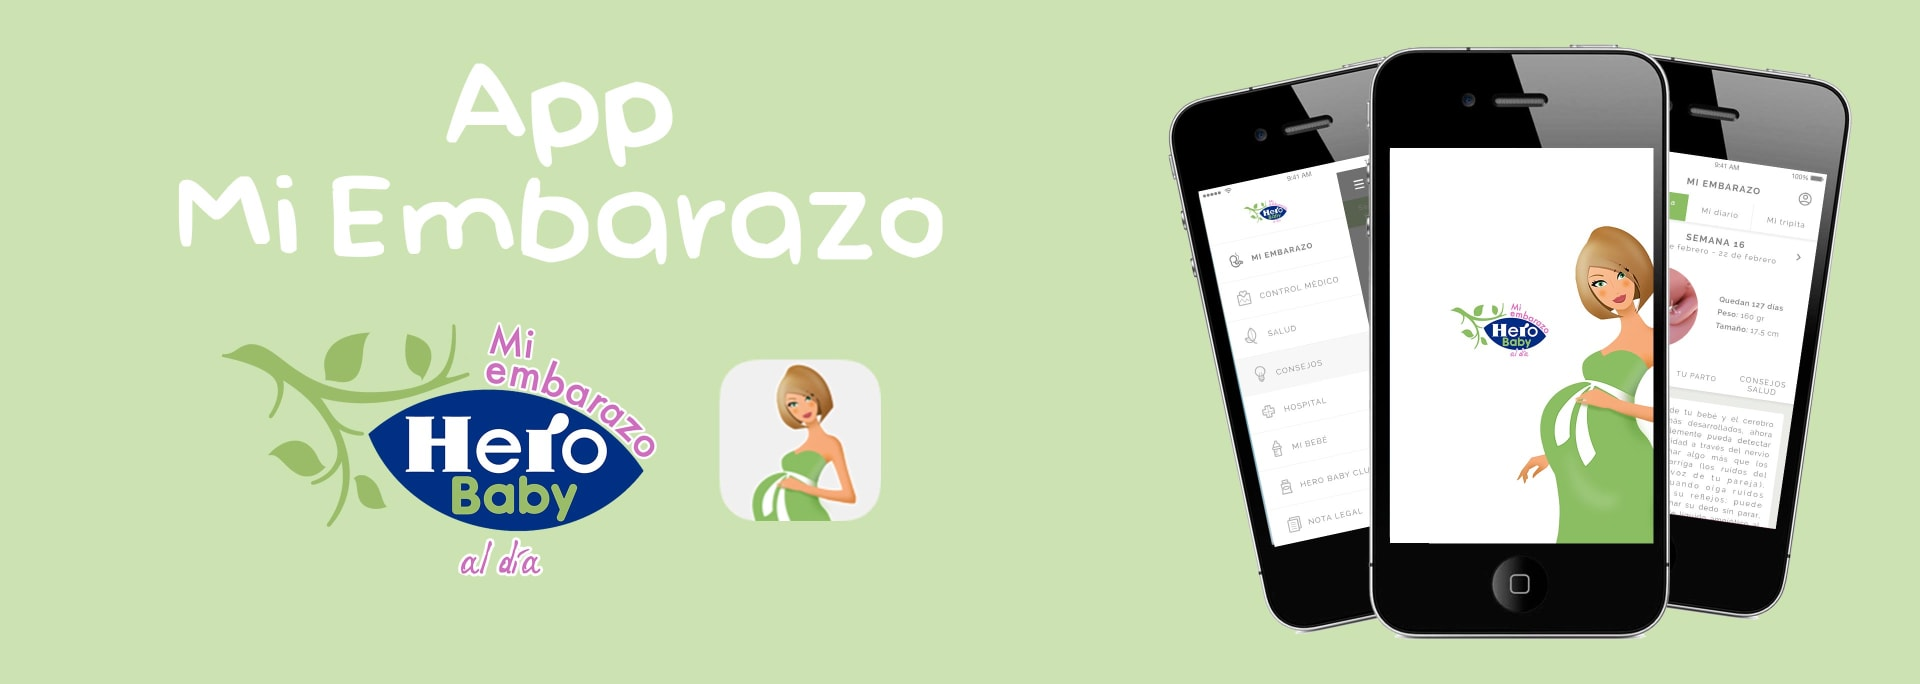 app embarazo